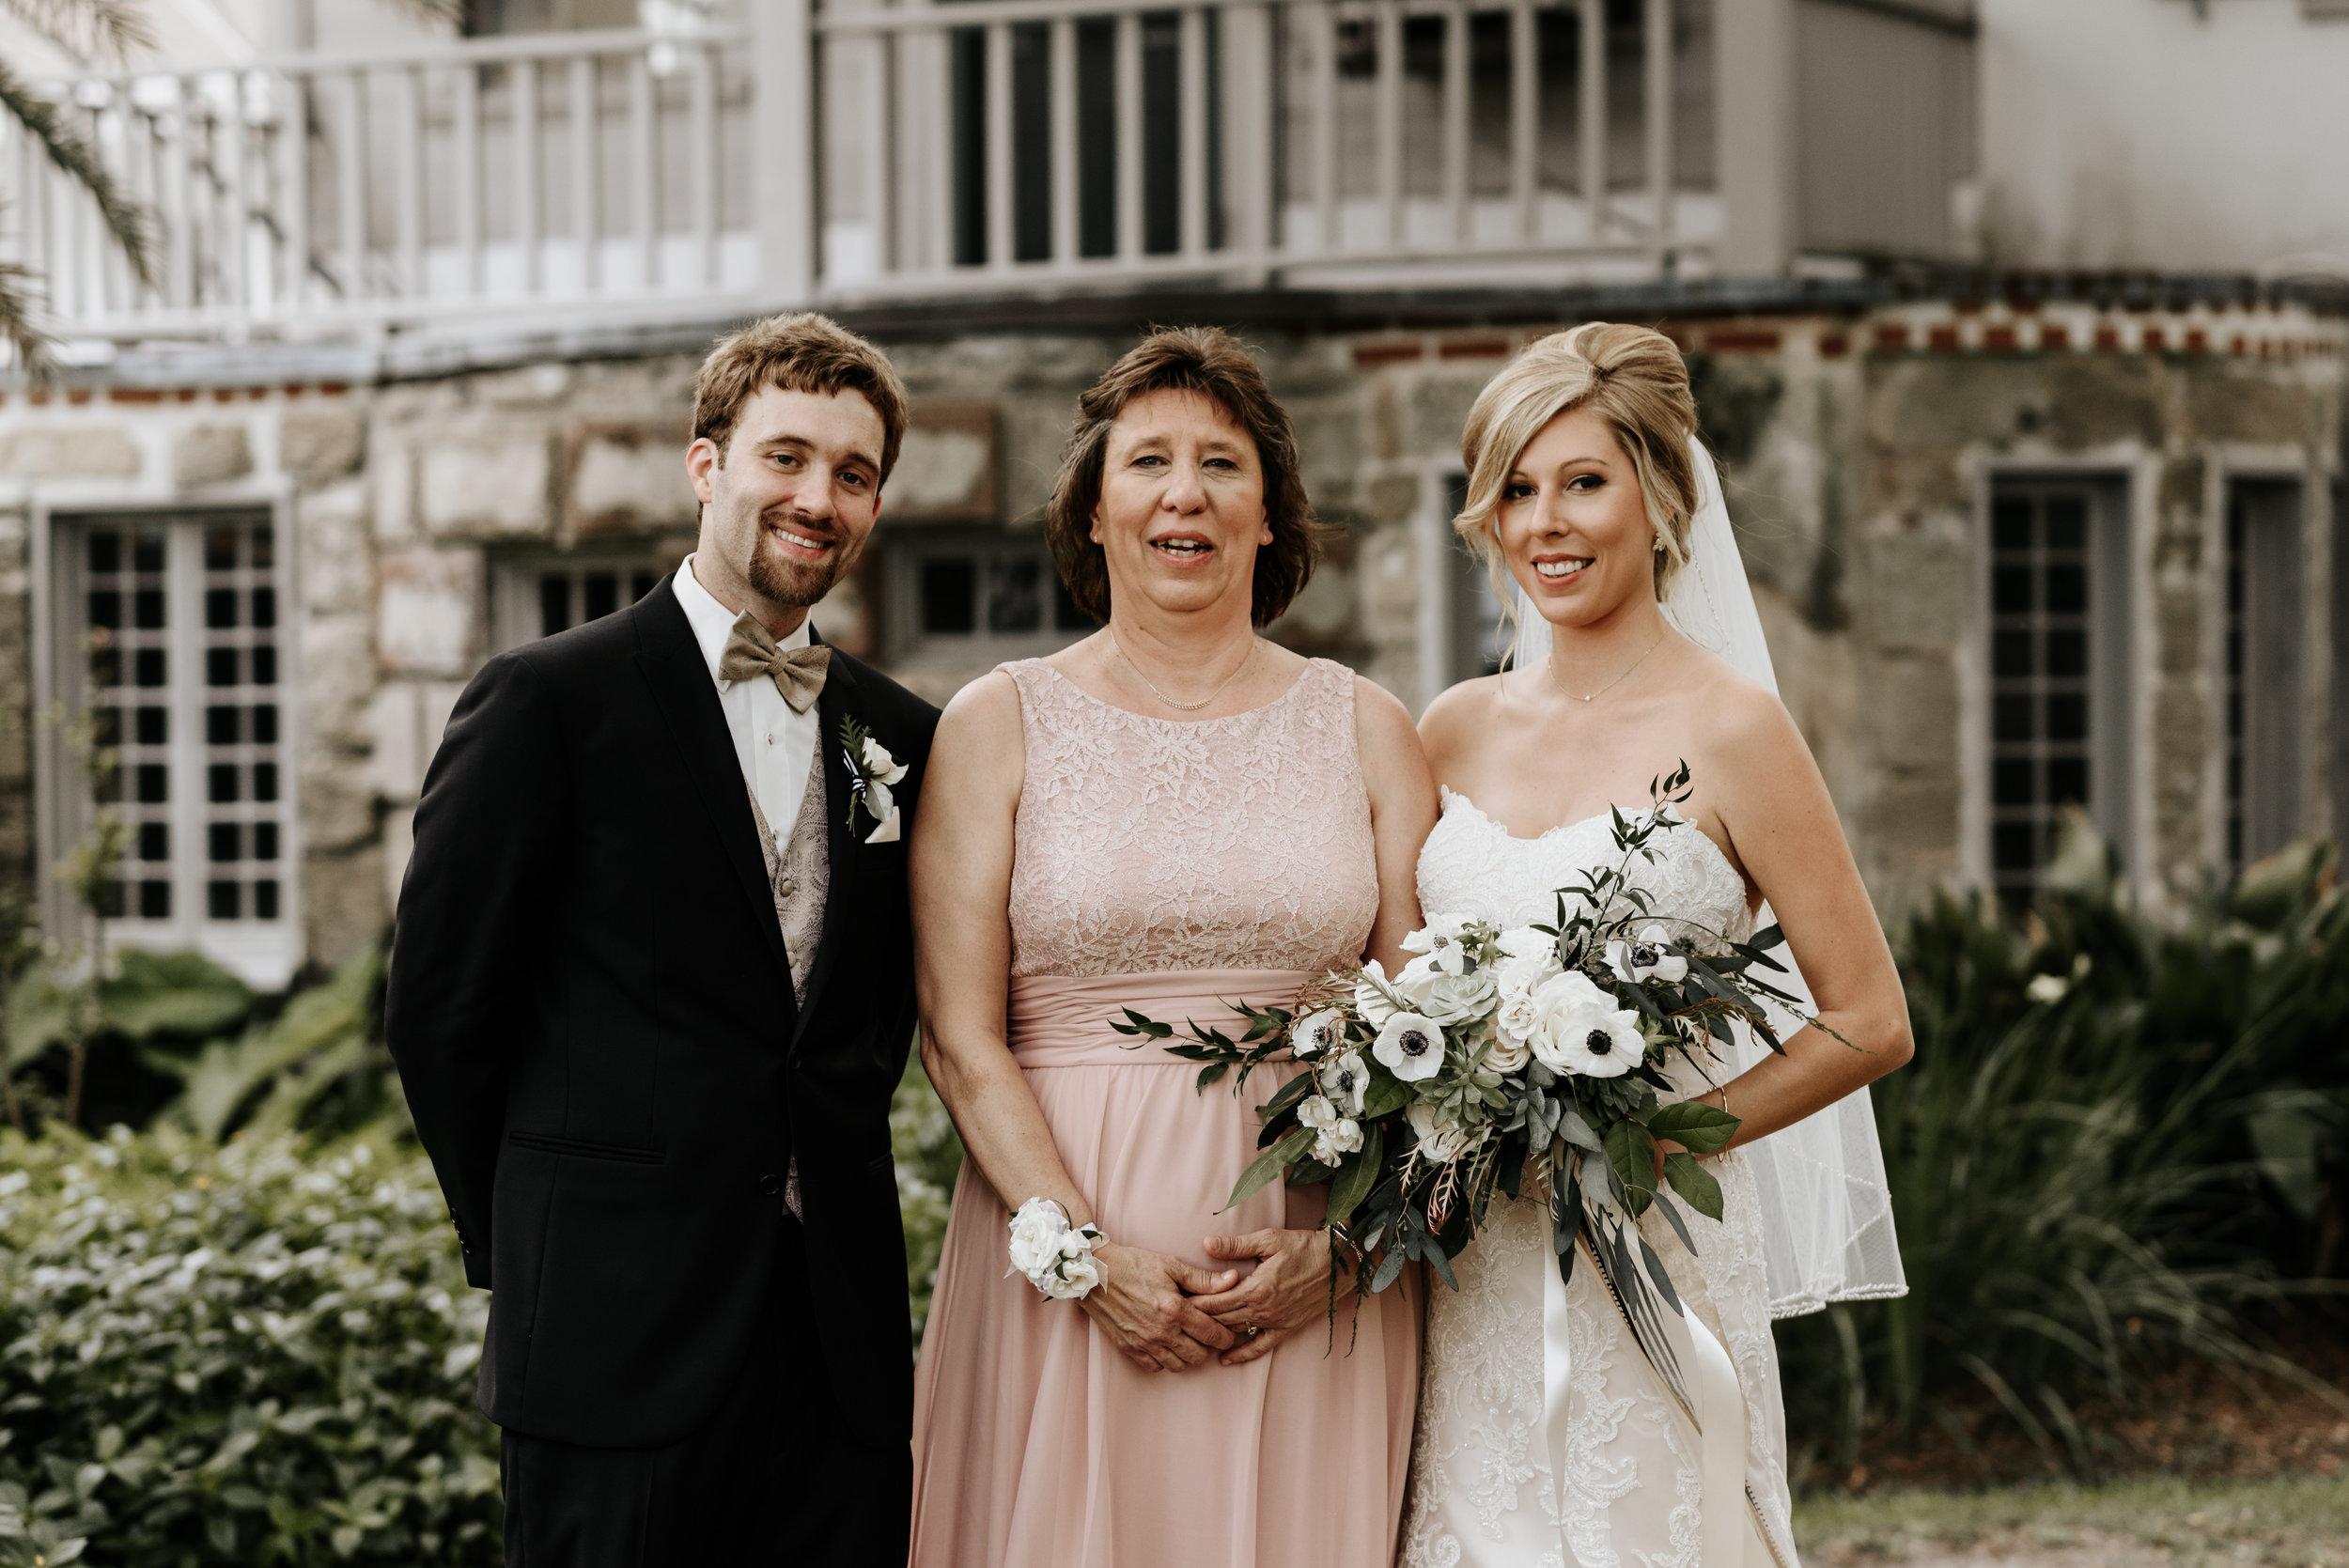 Mandy-Brad-Wedding-Previews-0469.jpg